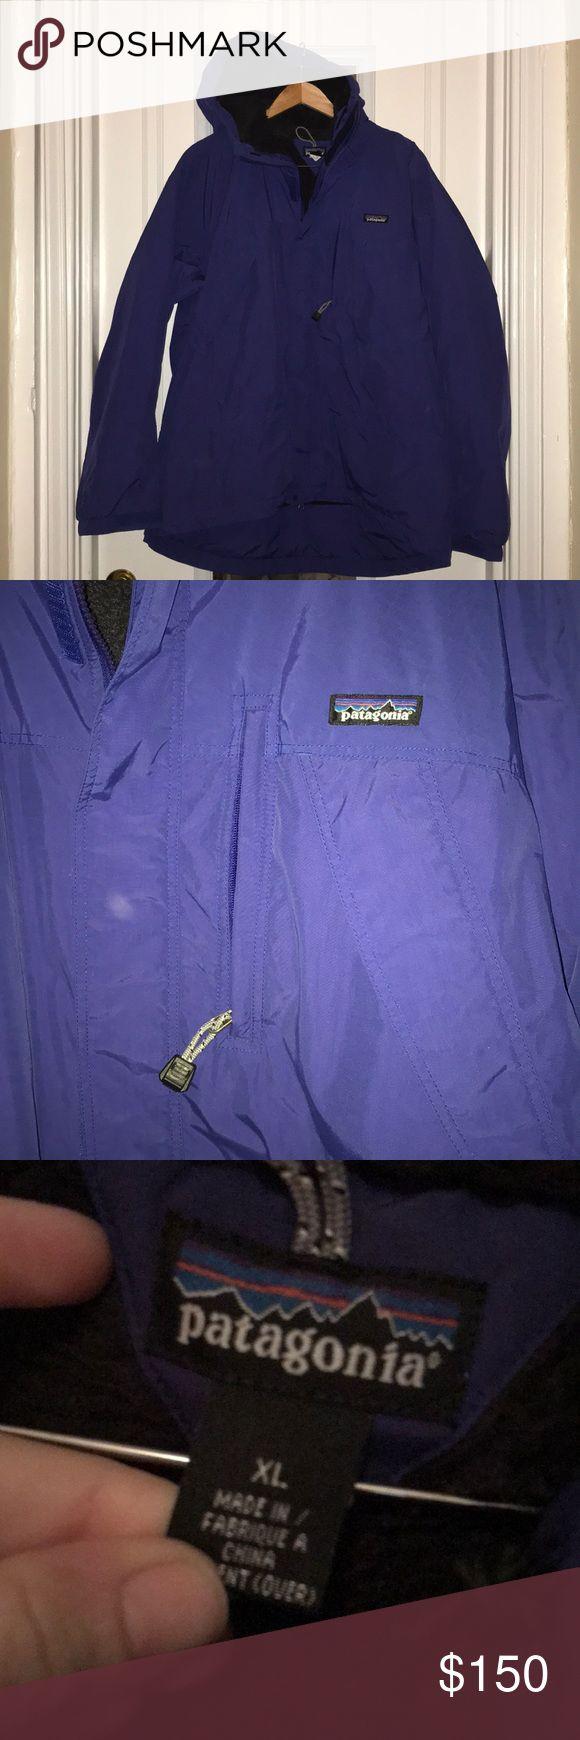 Blue Patagonia ski jacket Excellent condition. No flaws. Patagonia Jackets & Coats Ski & Snowboard